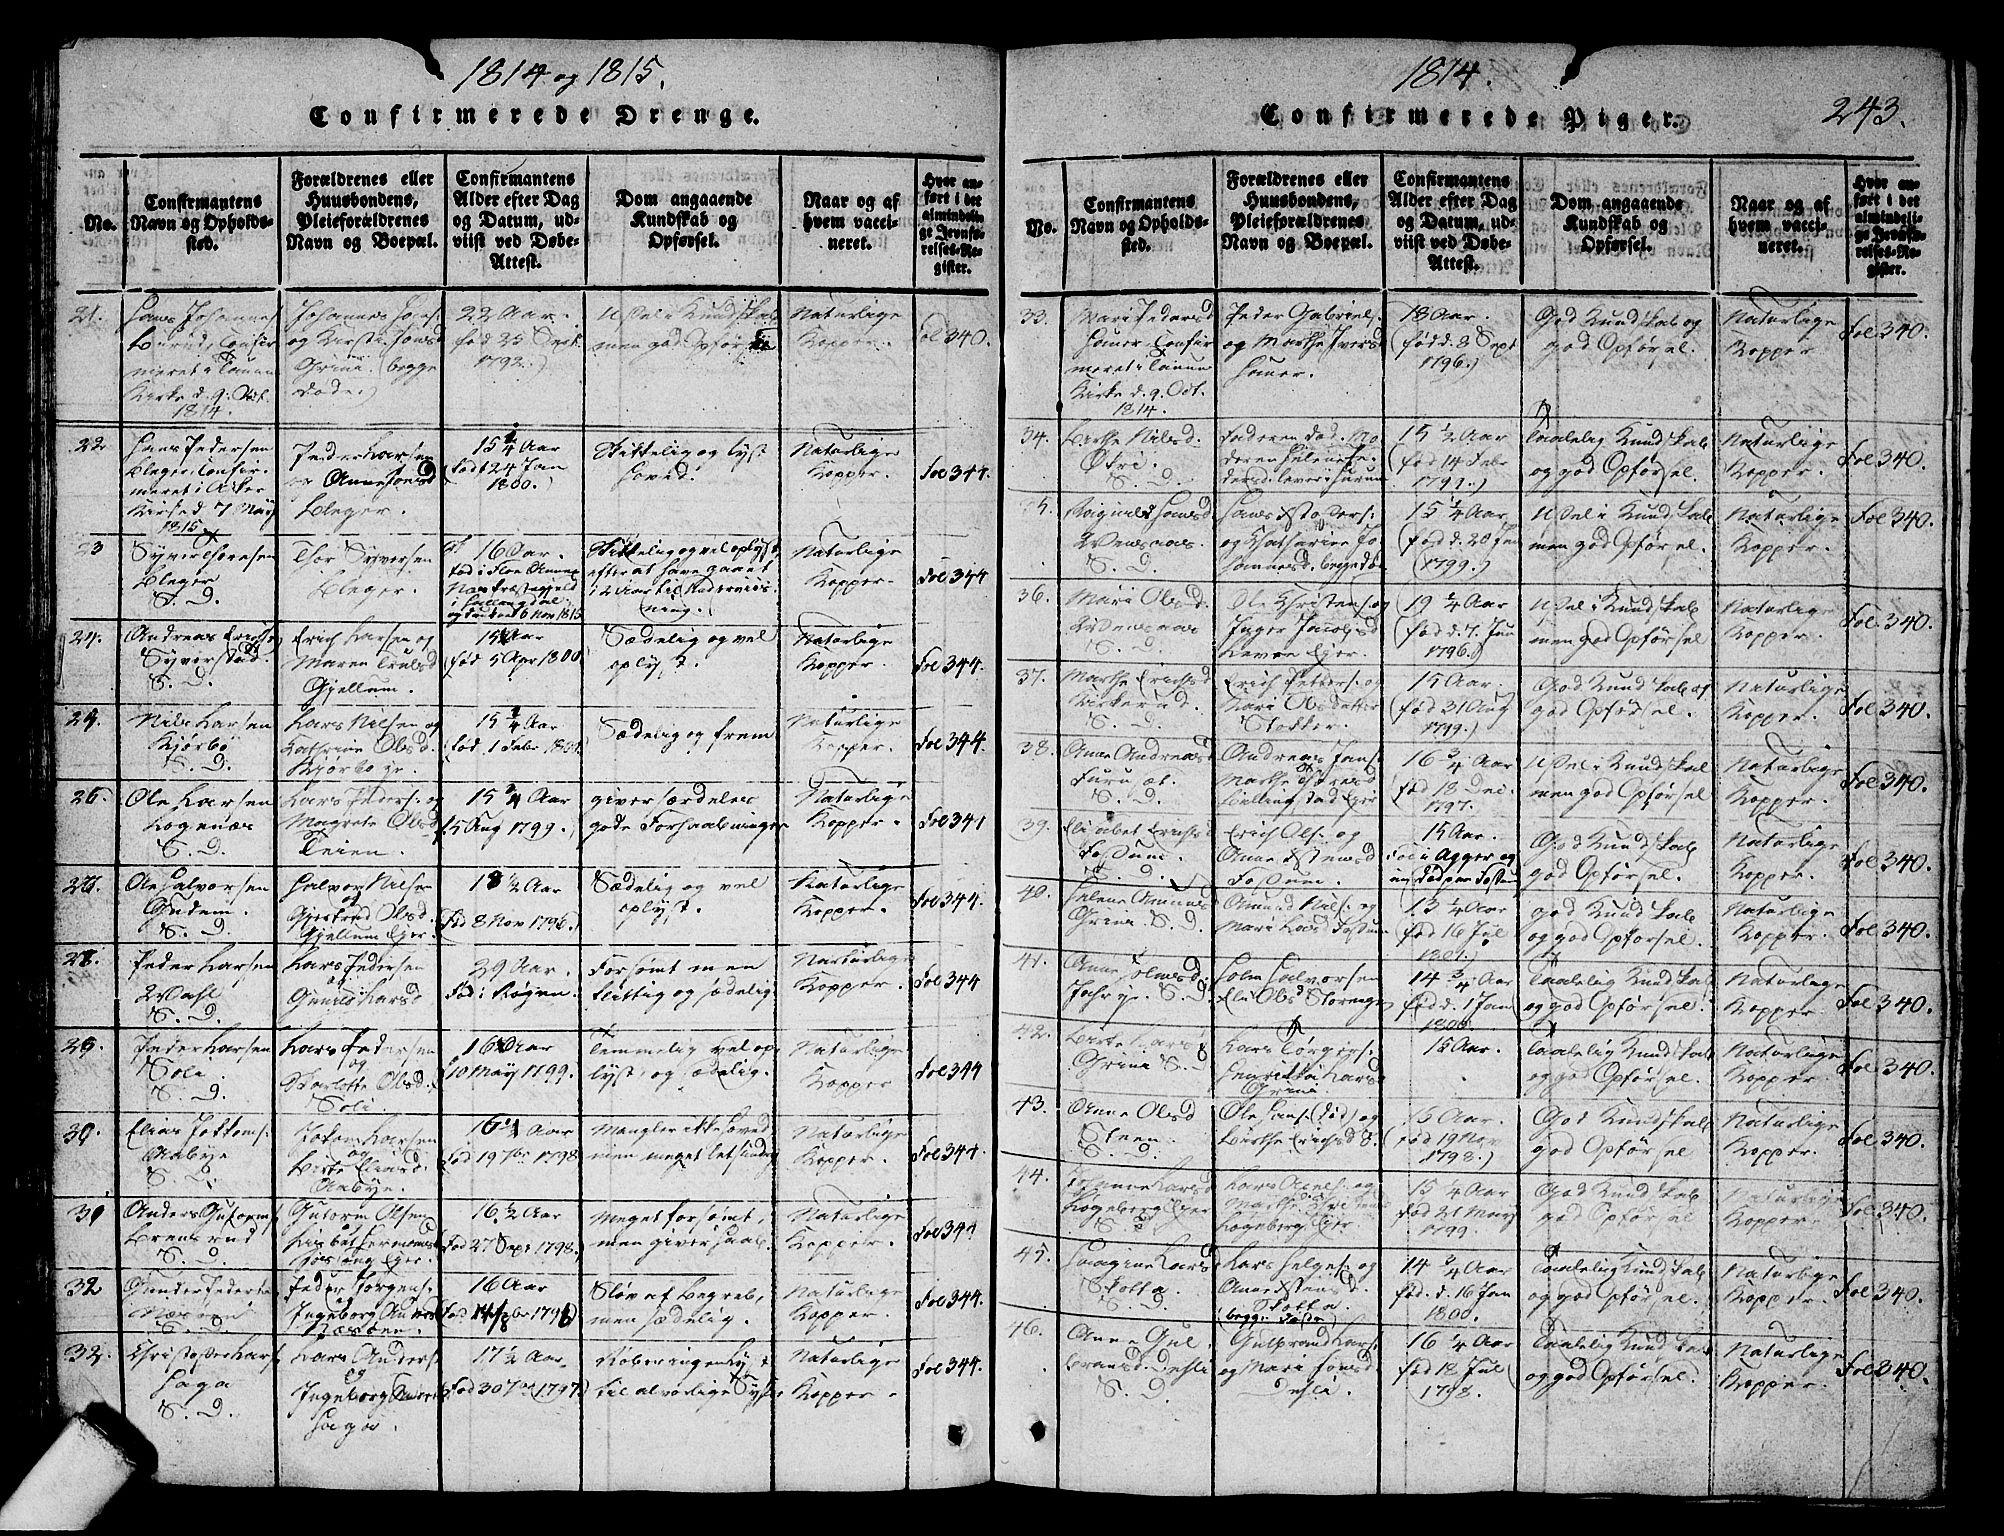 SAO, Asker prestekontor Kirkebøker, G/Ga/L0001: Klokkerbok nr. I 1, 1814-1830, s. 243